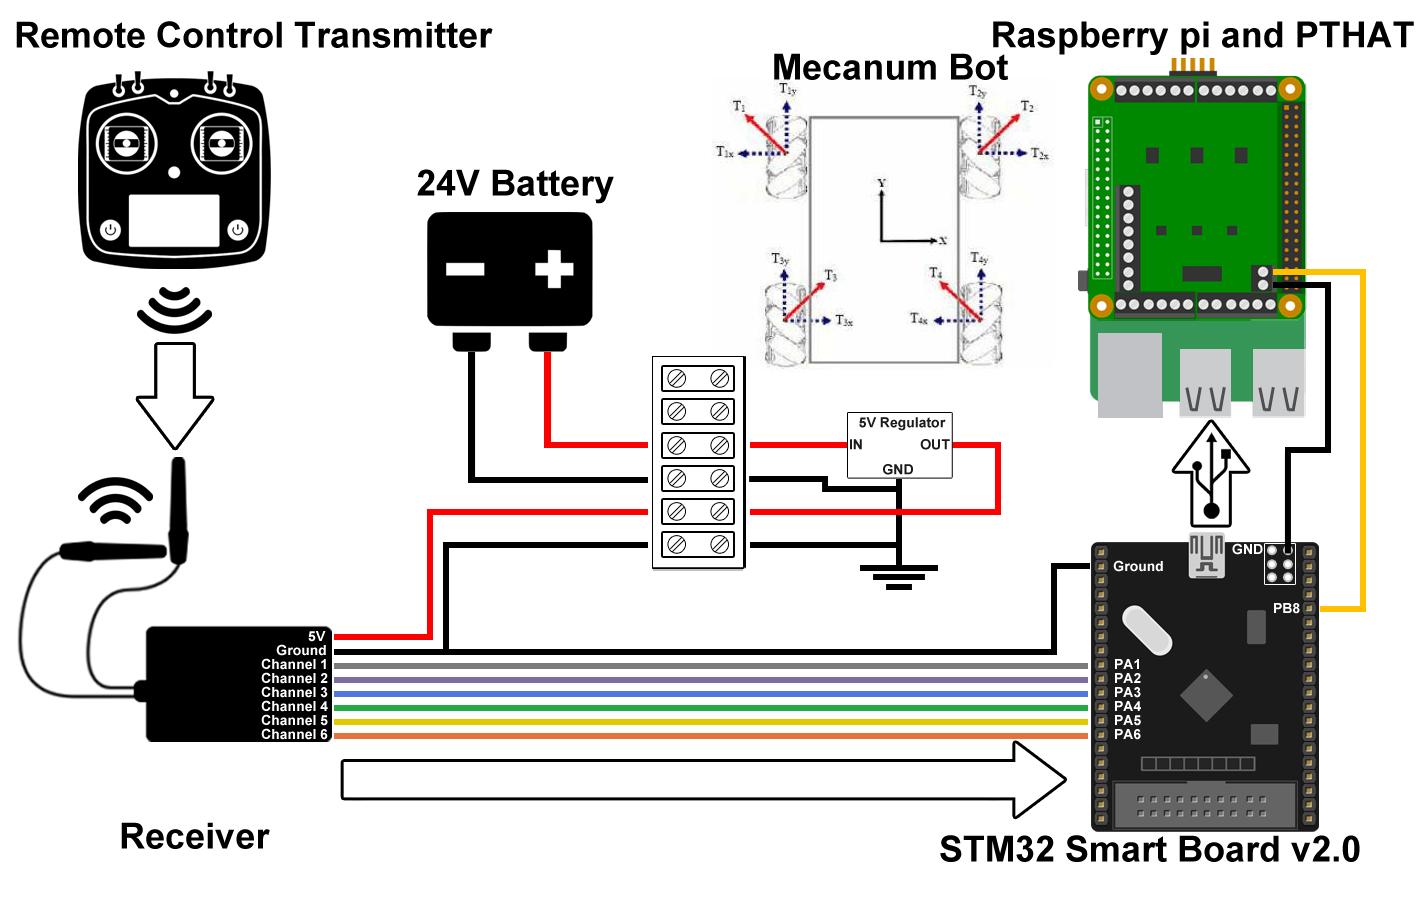 medium resolution of rc receiver wiring diagram wiring library rc helicopter receiver wiring diagram rc receiver wiring diagram automotive